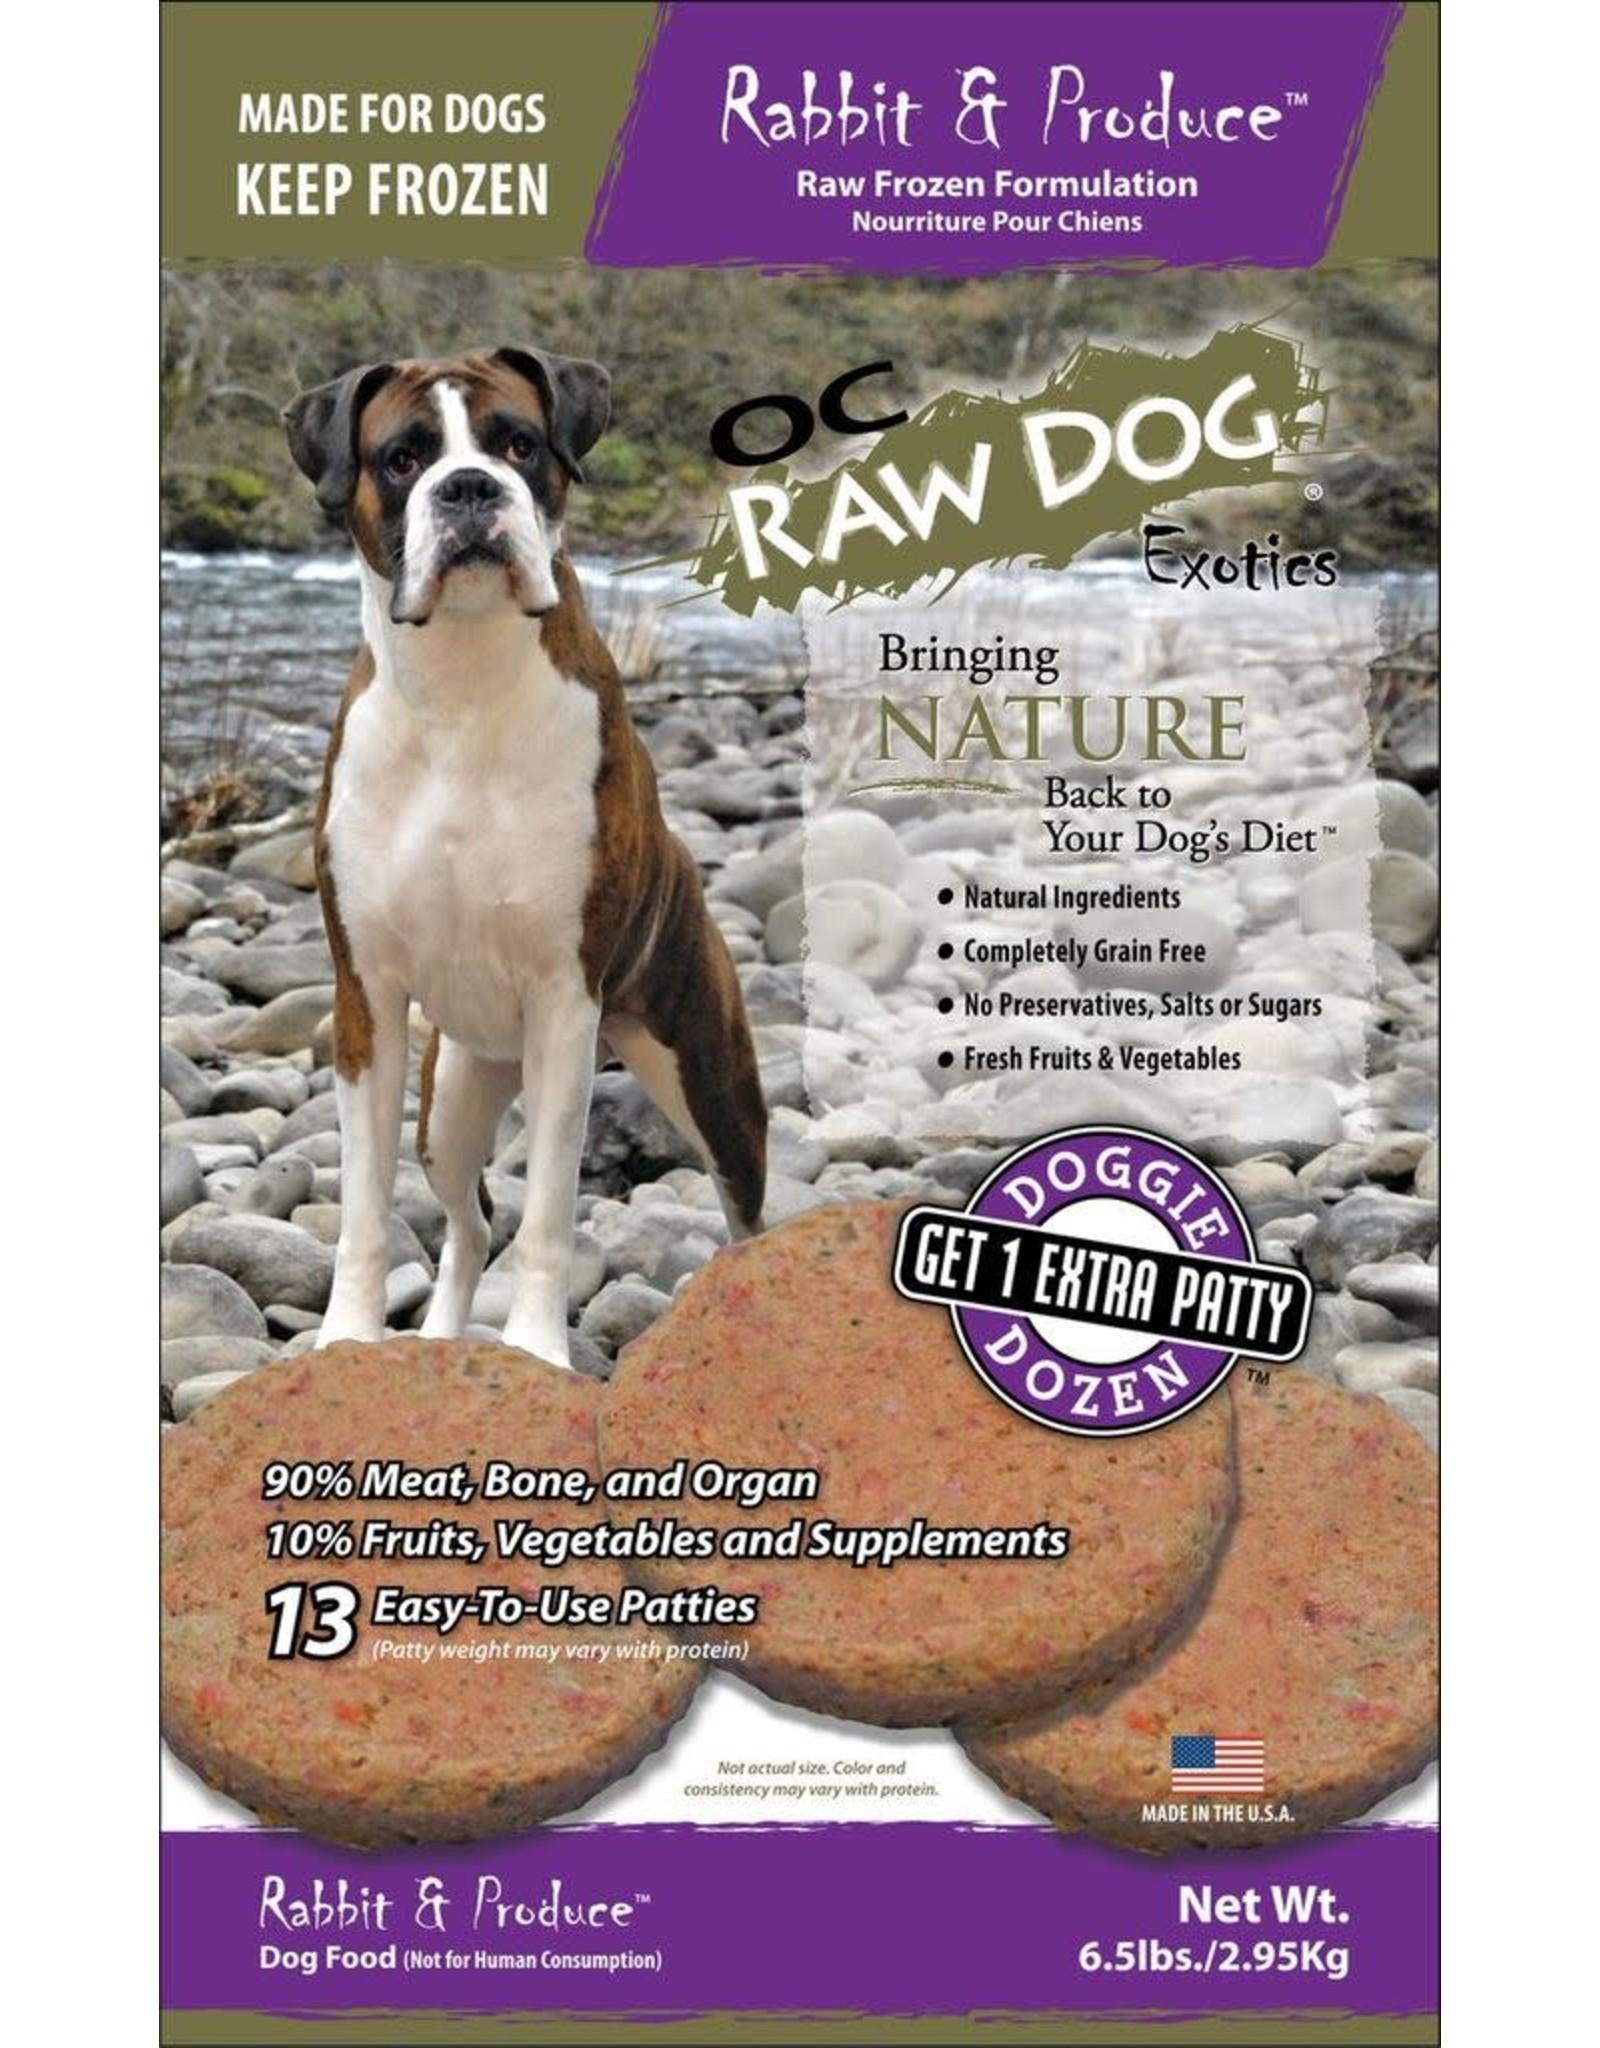 OC Raw Dog OC RAW DOG FROZEN RAW MEATY ROX RABBIT & PRODUCE